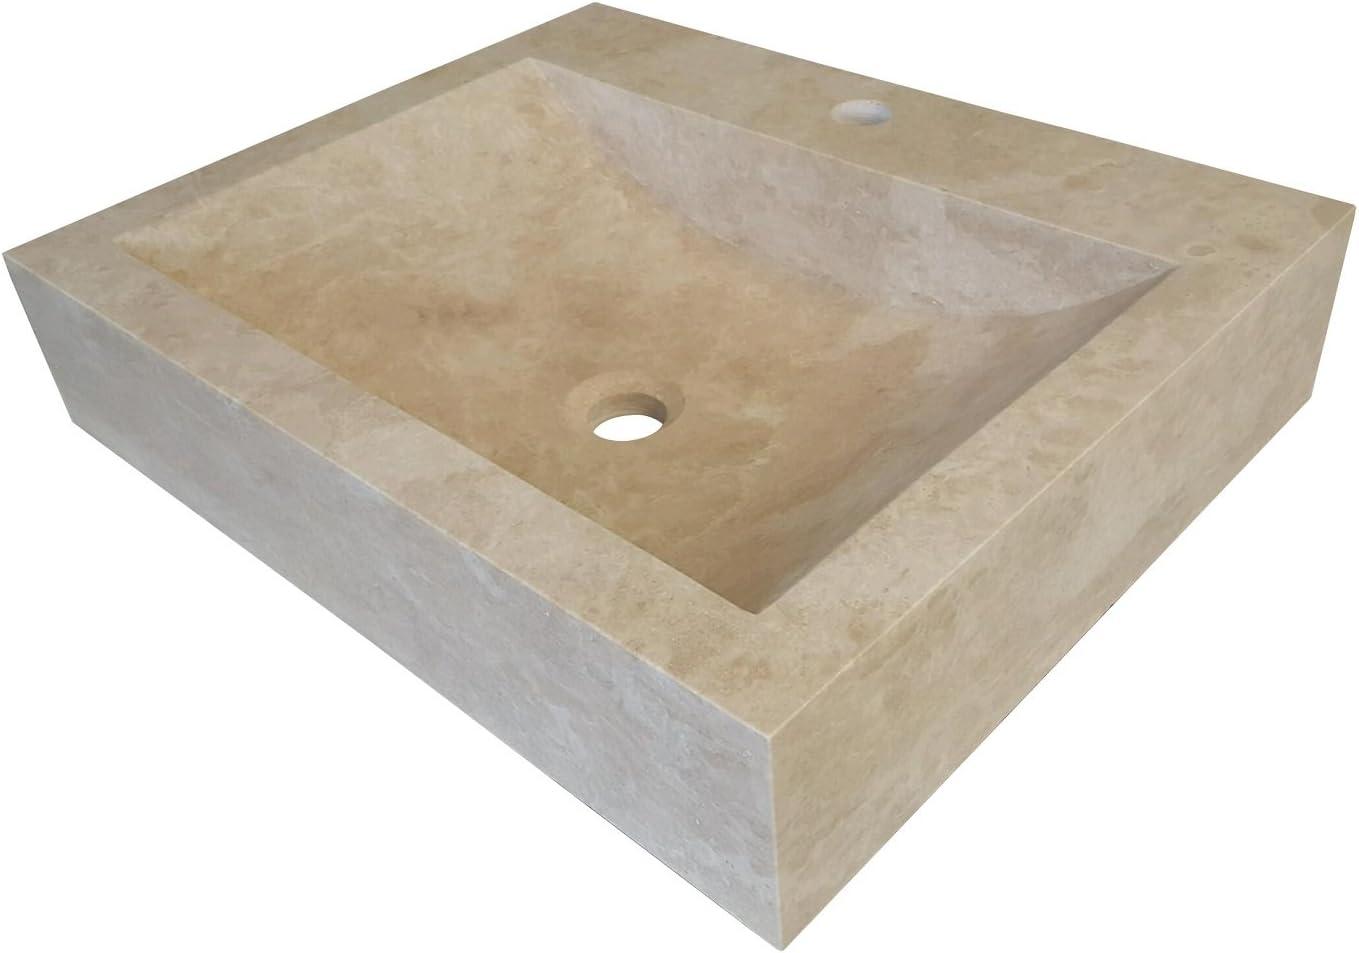 Rectangular Natural Stone Vessel Sink Light Travertine Amazon Com